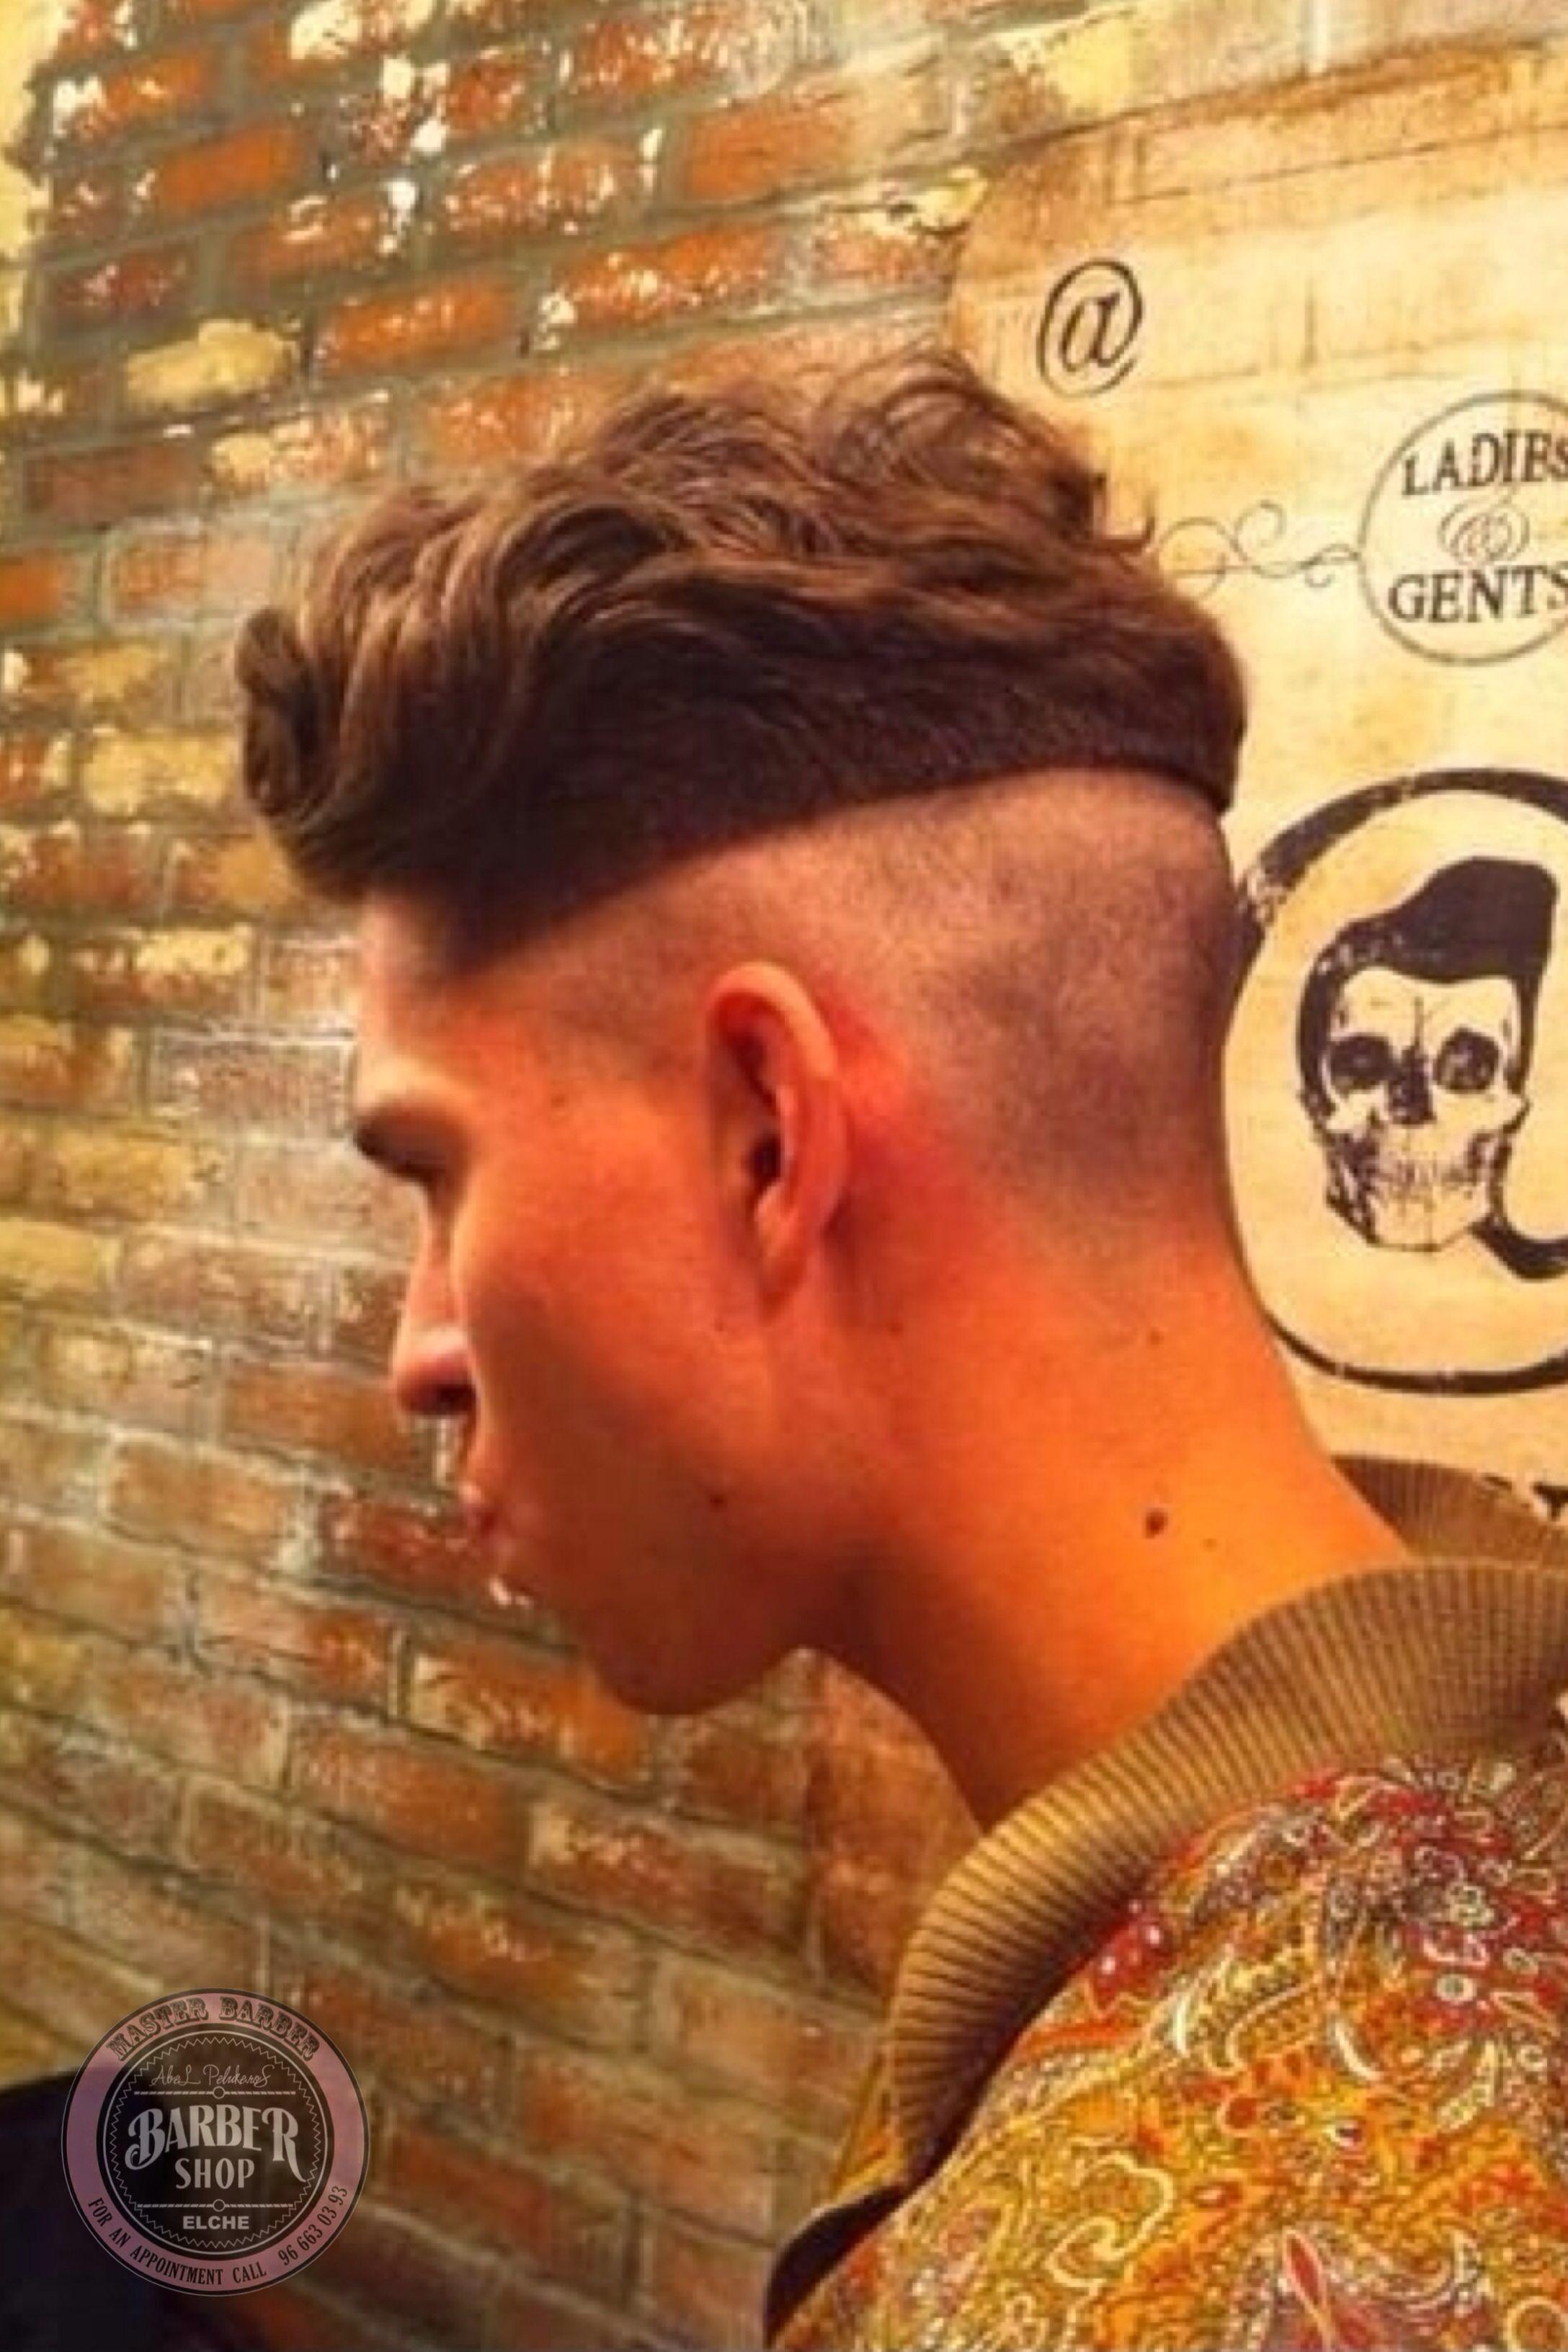 ✔️Abelpelukeros Elche BARBER SHOP Cortes de pelo masculinos, hombre Mens undercut, Cute Ideal mens hair cut hair Men's Fashion  Boys With Sexy Hair #hair #fashion #sexy #hairstyles #cuts #hair #Mens #Shaving #Afeitado AbelPelukeros Elche ESPECIALISTAS PELUQUERIA MASCULINA. http://abelpelukeros-abelpelukeros.blogspot.com.es